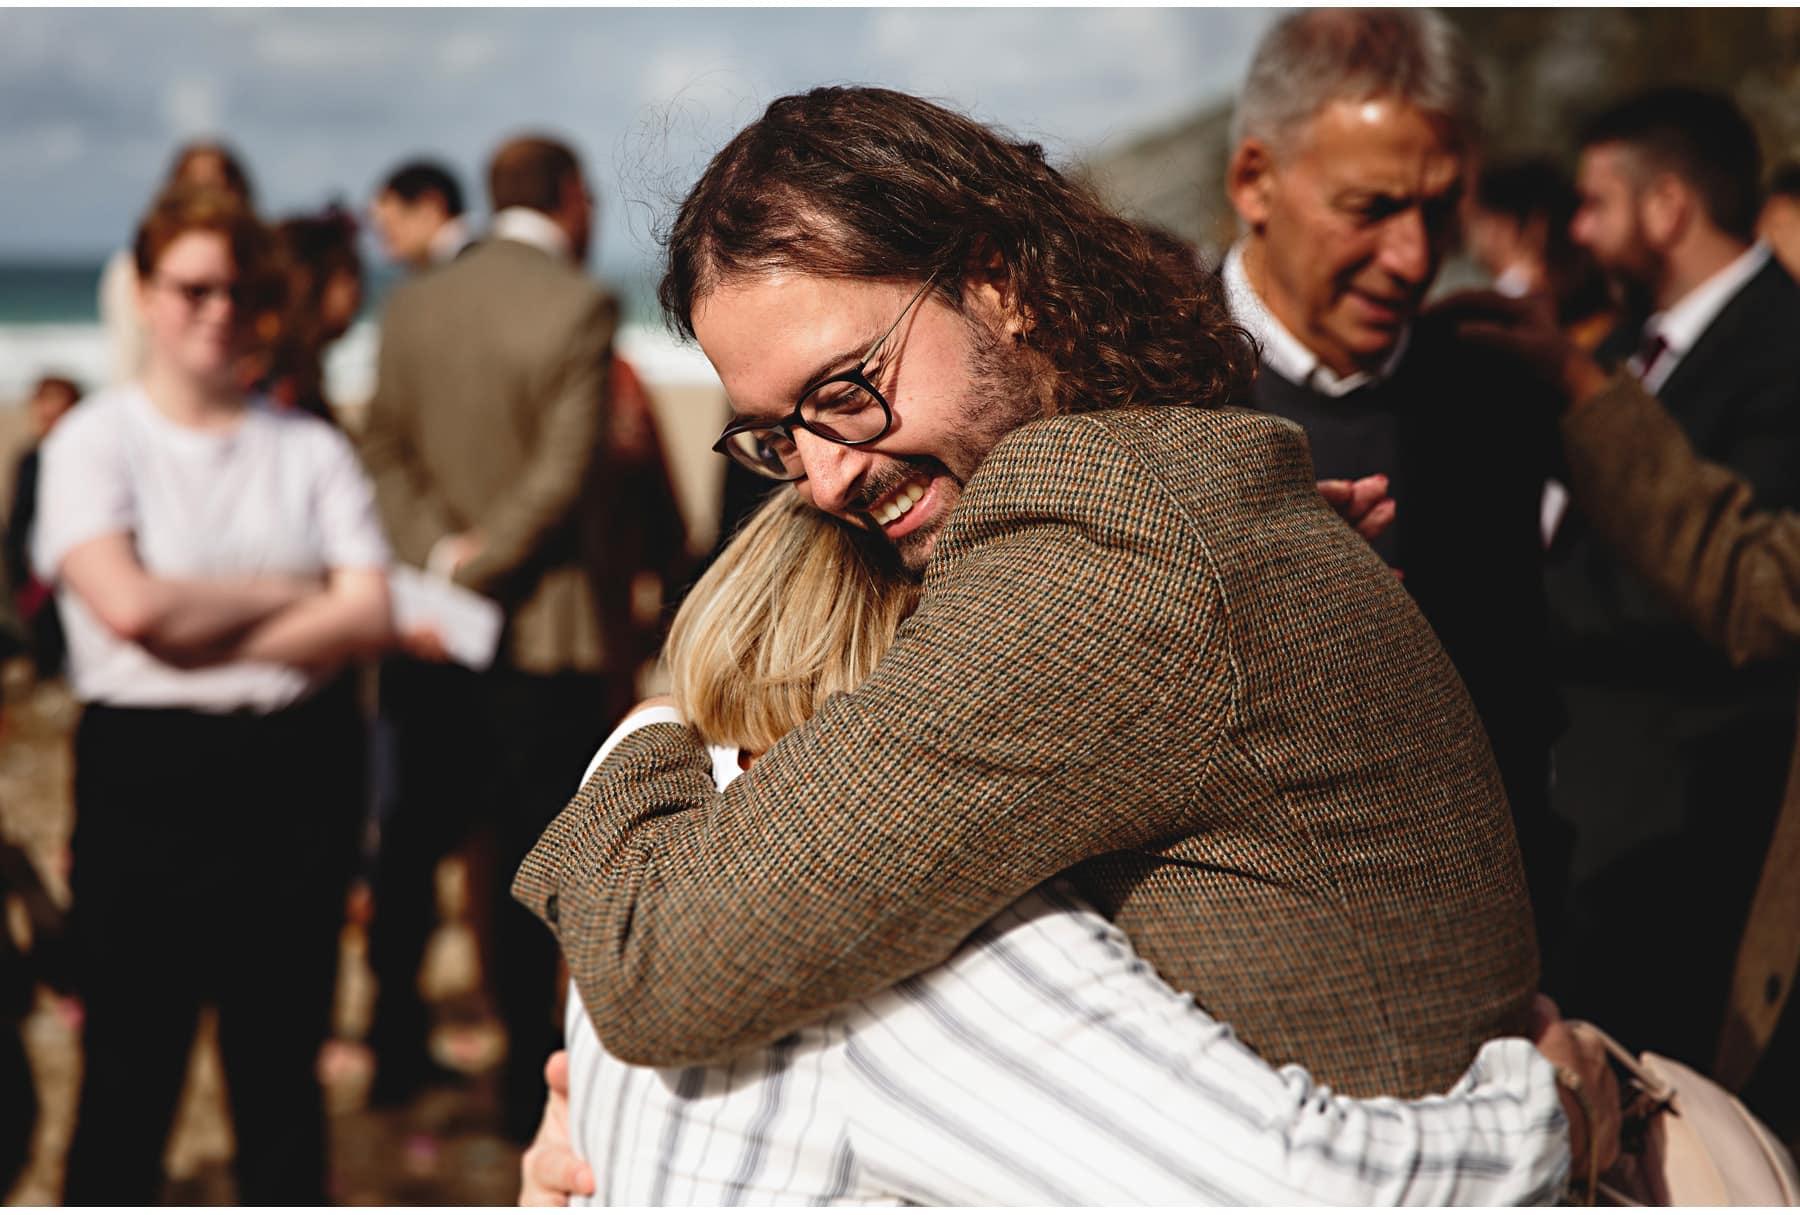 the groom hugging wedding guests